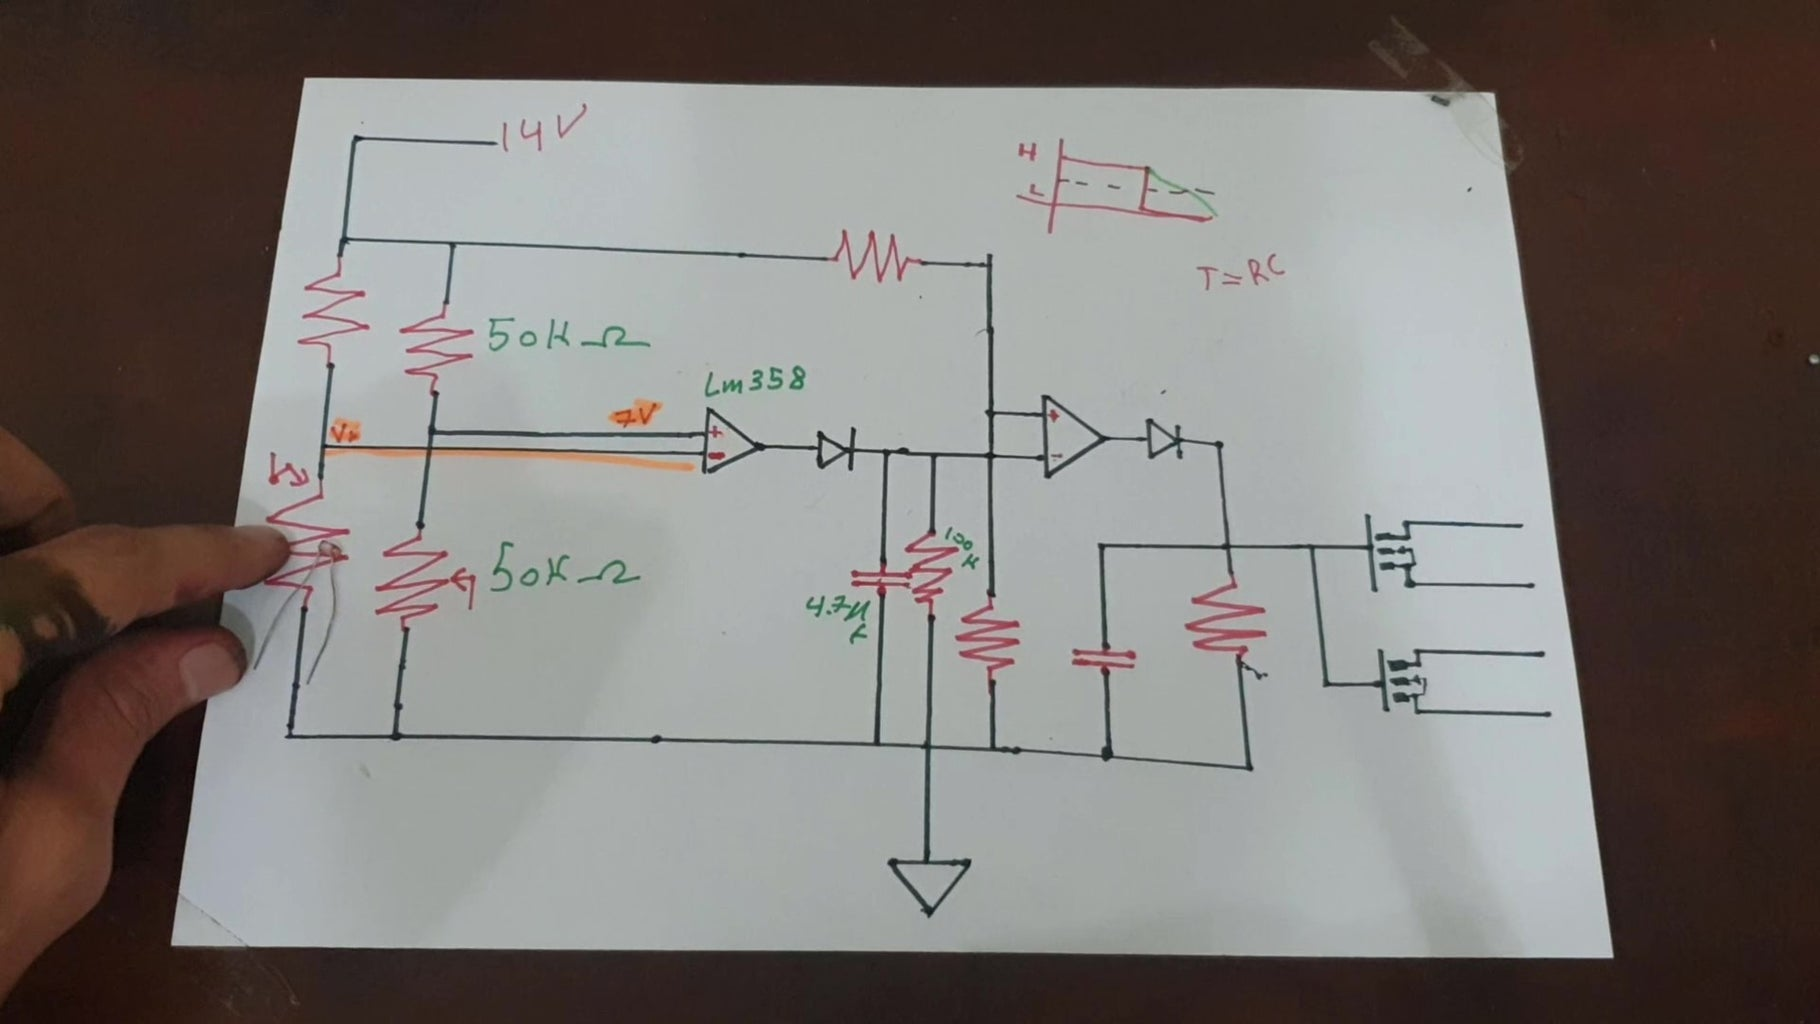 The Circuit Schematic